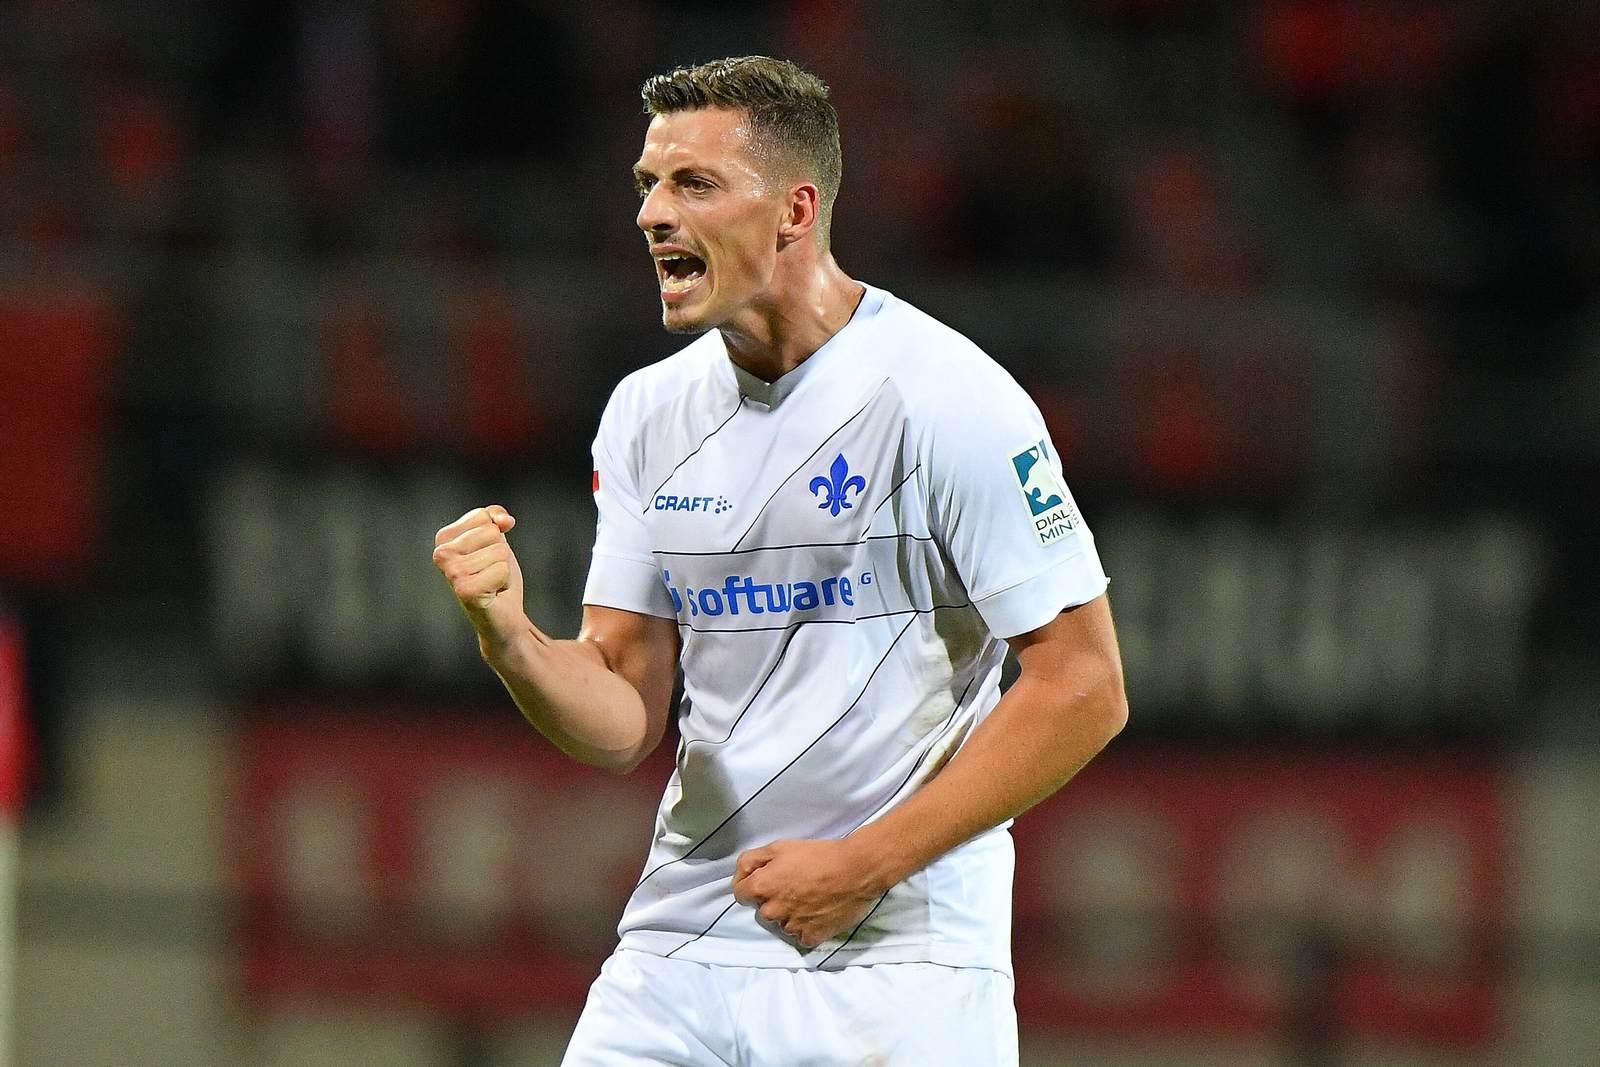 Nicolai Rapp bejubelt seinen Treffer gegen Nürnberg.